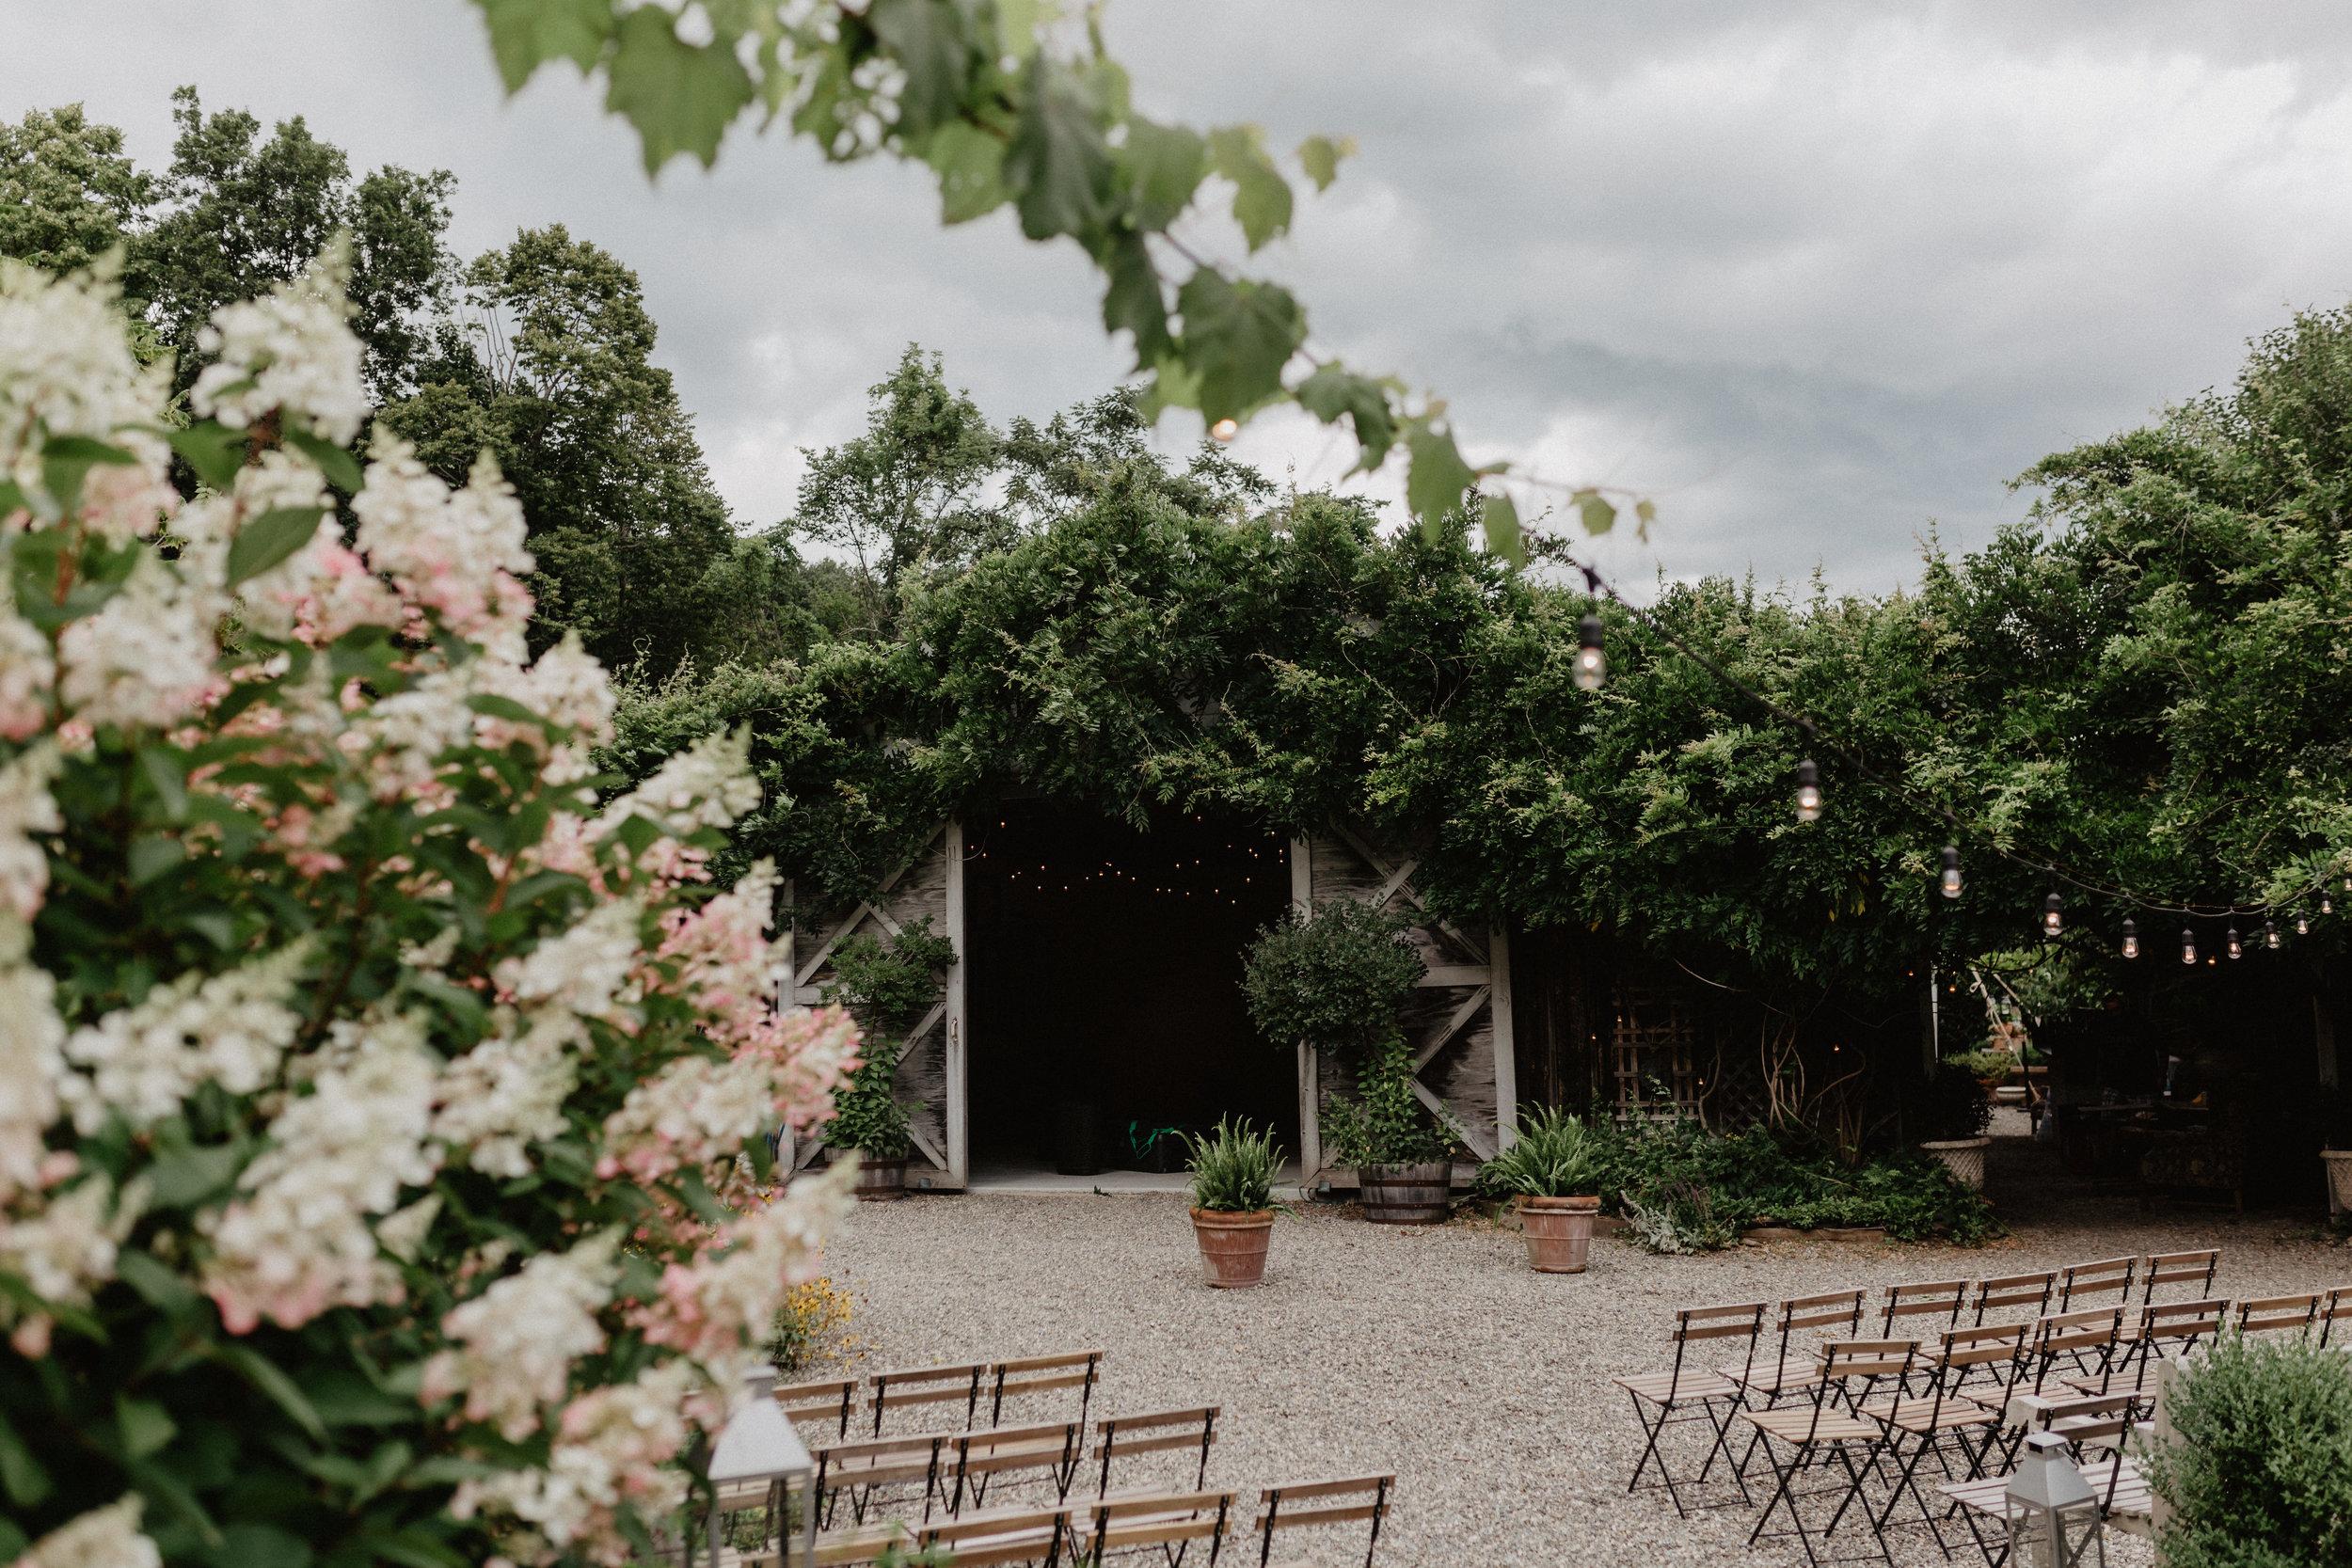 m-and-d-farm-wedding-12.jpg